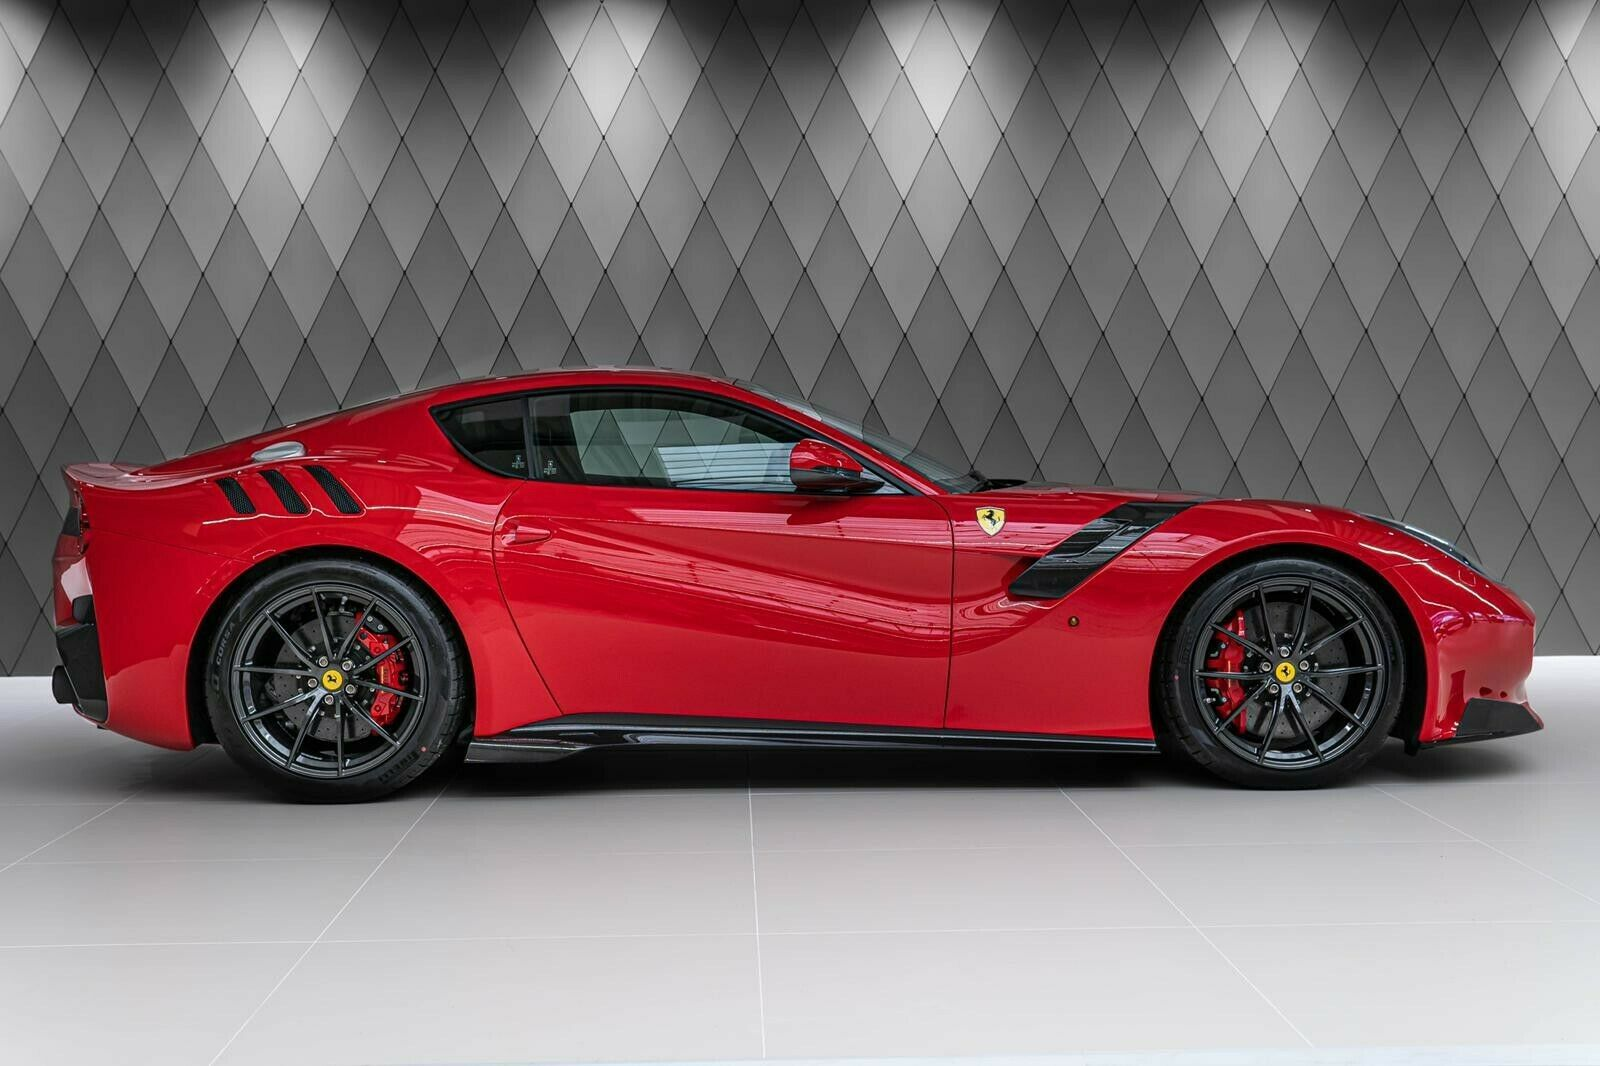 For Sale Ferrari F12 Tdf Luxury Cars Hamburg Germany For Sale On Luxurypulse Ferrari F12 Ferrari F12 Tdf Ferrari